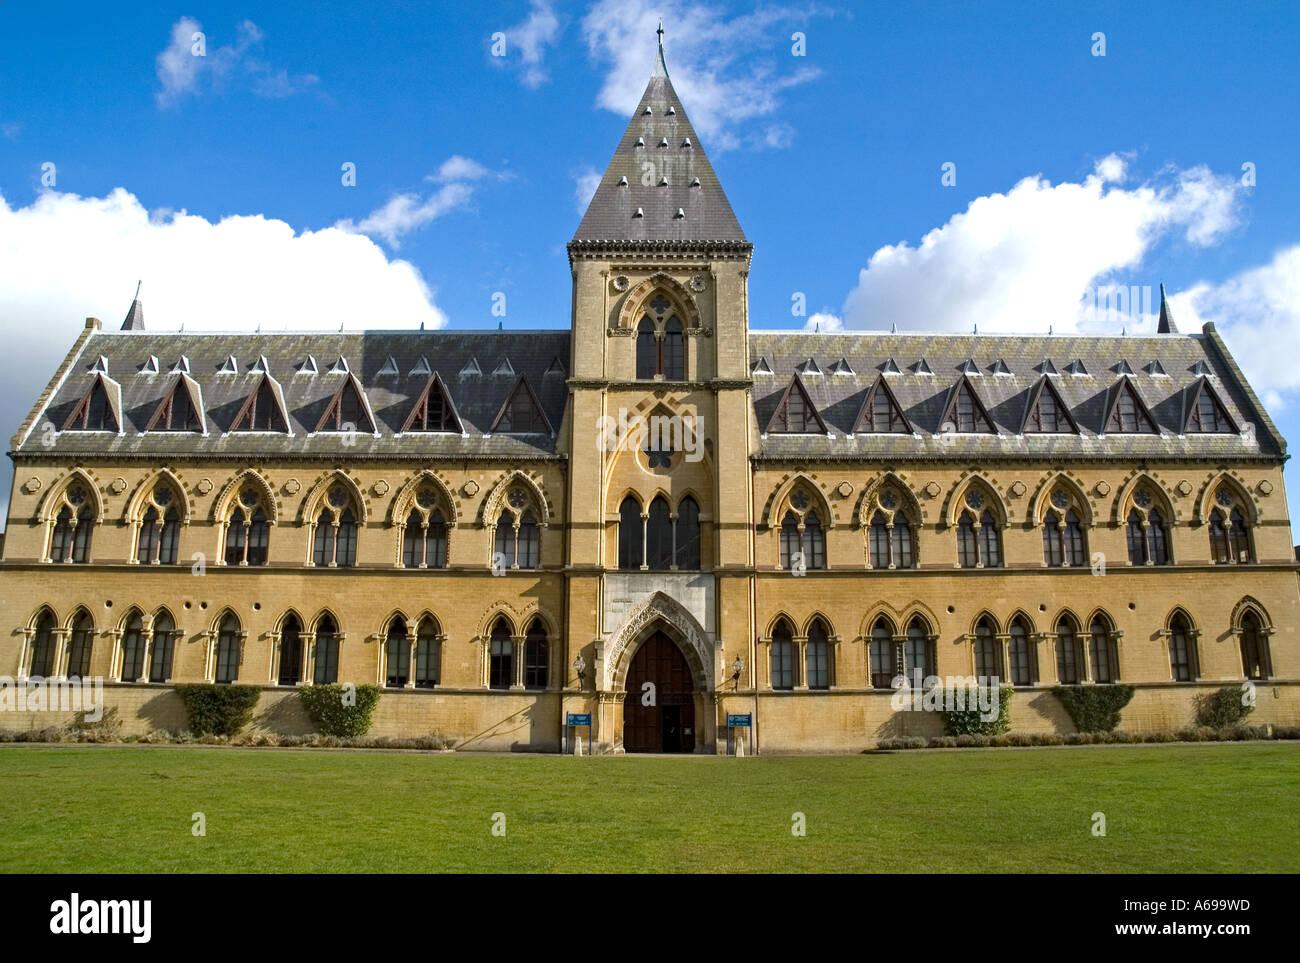 PITT RIVERS MUSEUM OXFORD - Stock Image